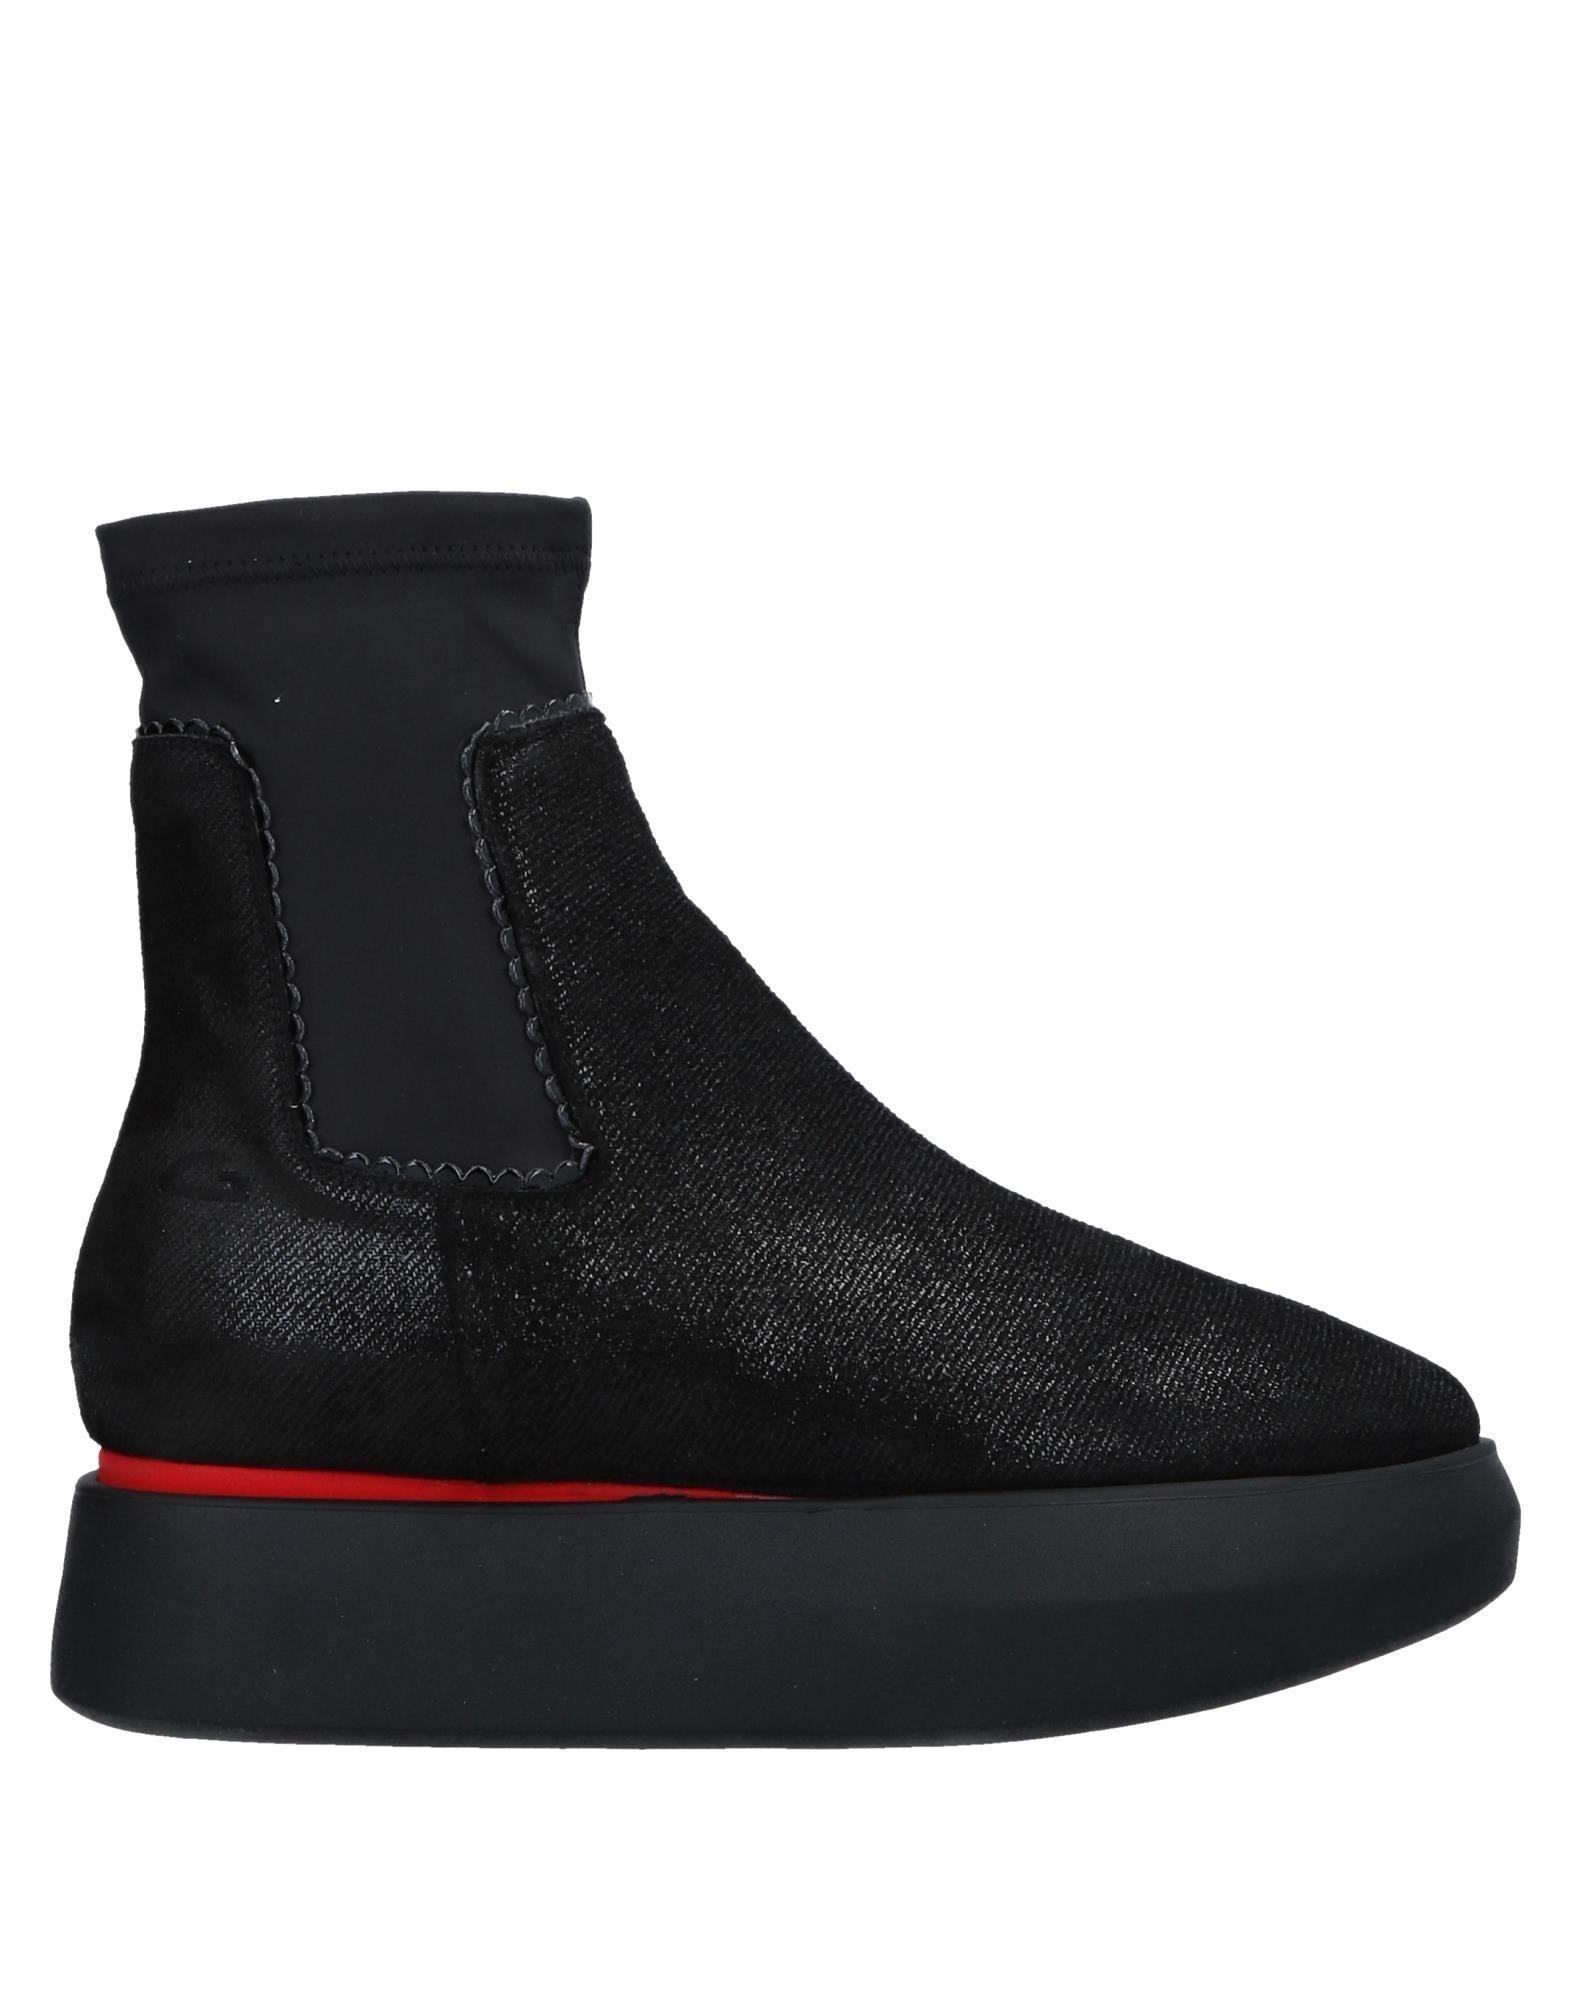 Alberto Guardiani 11514299MRGut Stiefelette Damen  11514299MRGut Guardiani aussehende strapazierfähige Schuhe 8c6eb8